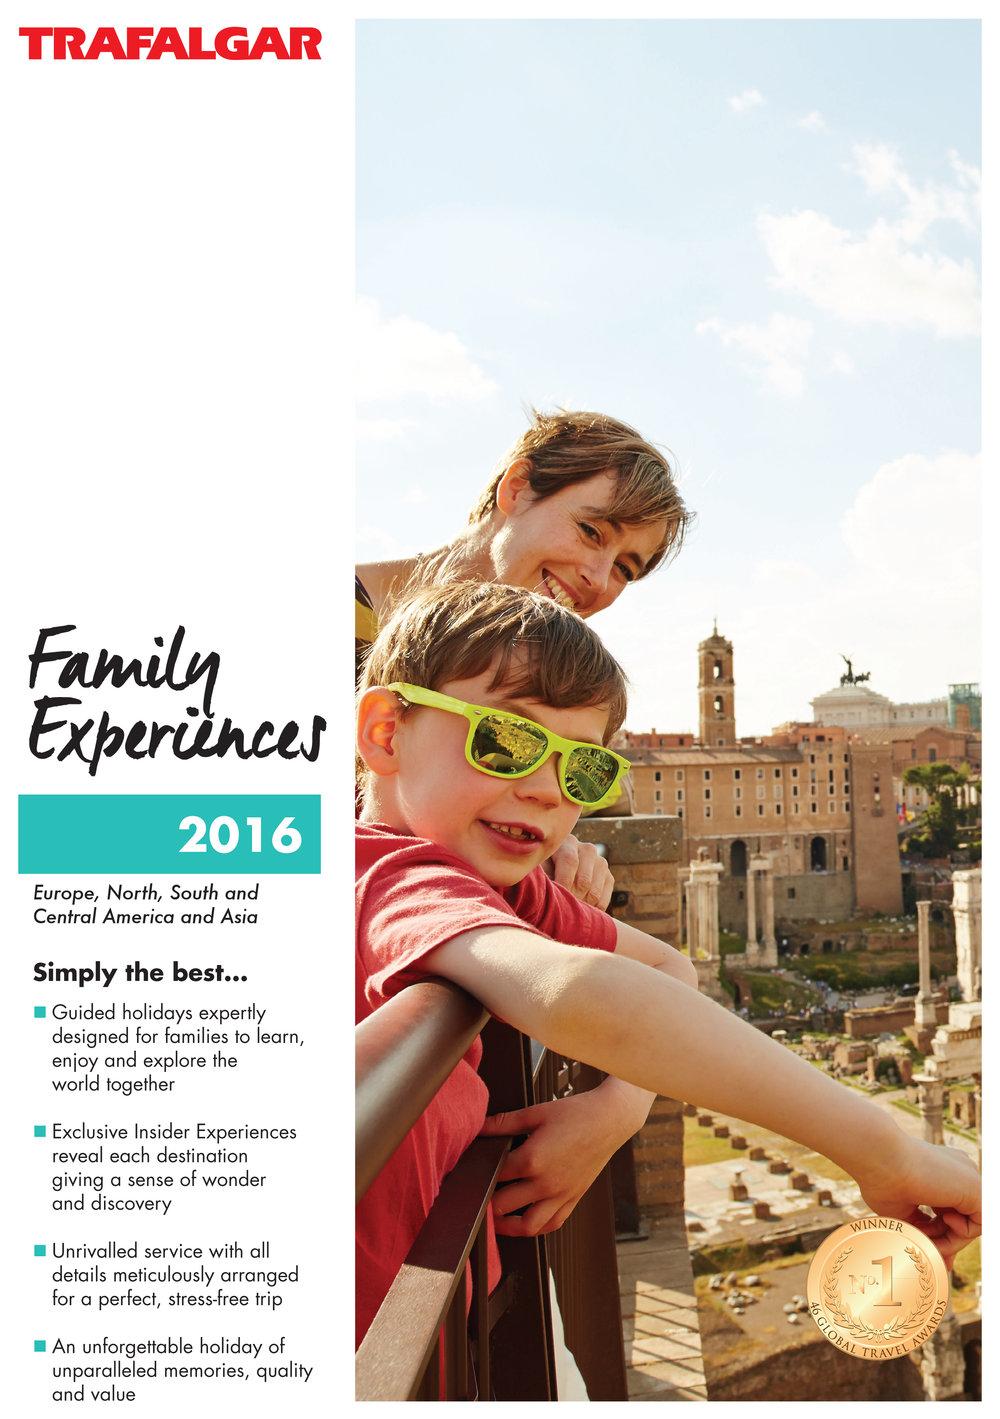 FAMILY EXPERIENCES 2016